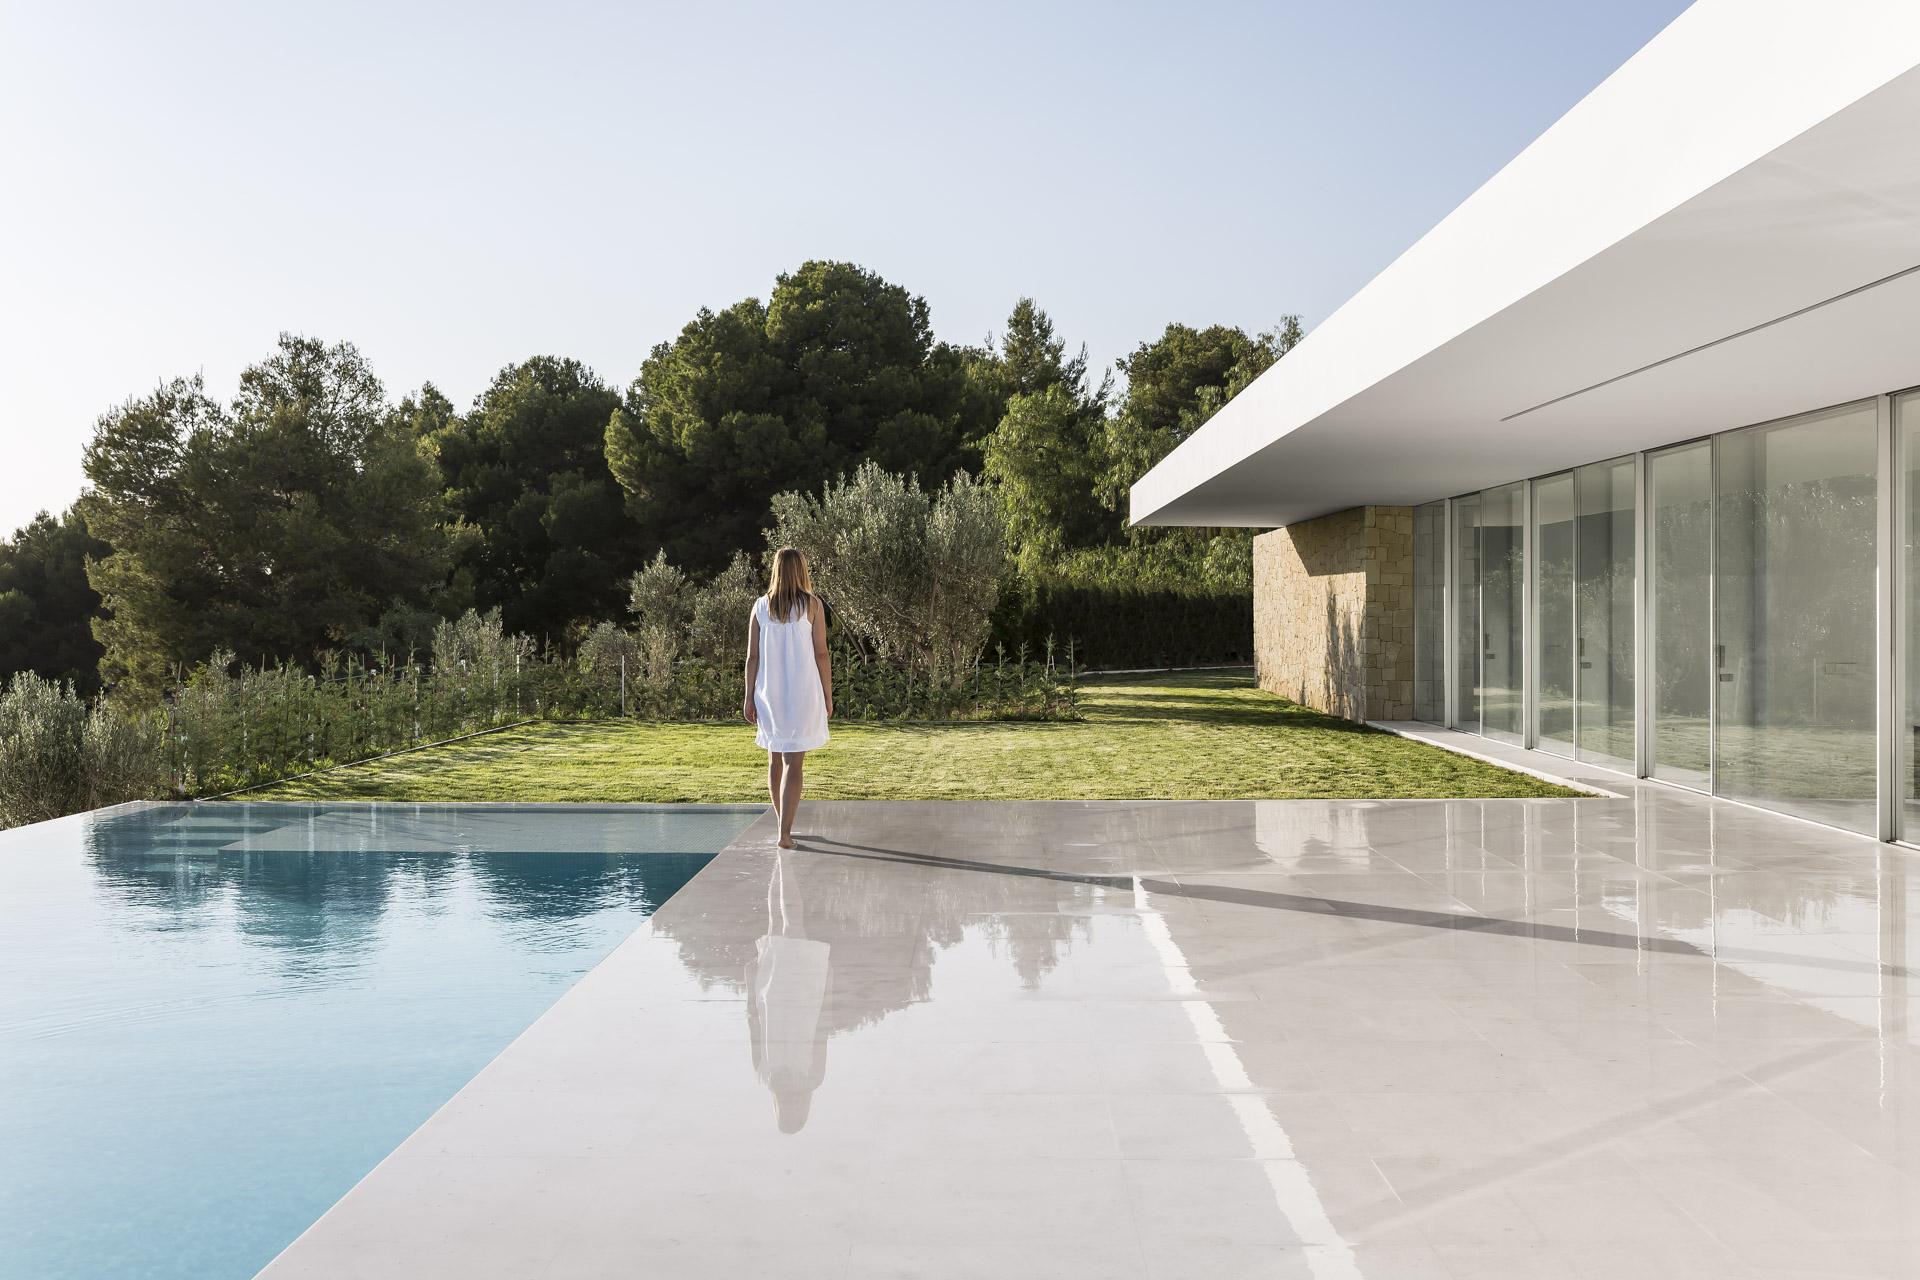 fotografia-arquitectura-valencia-german-cabo-gallardo-llopis-villamarchante-vivienda-39